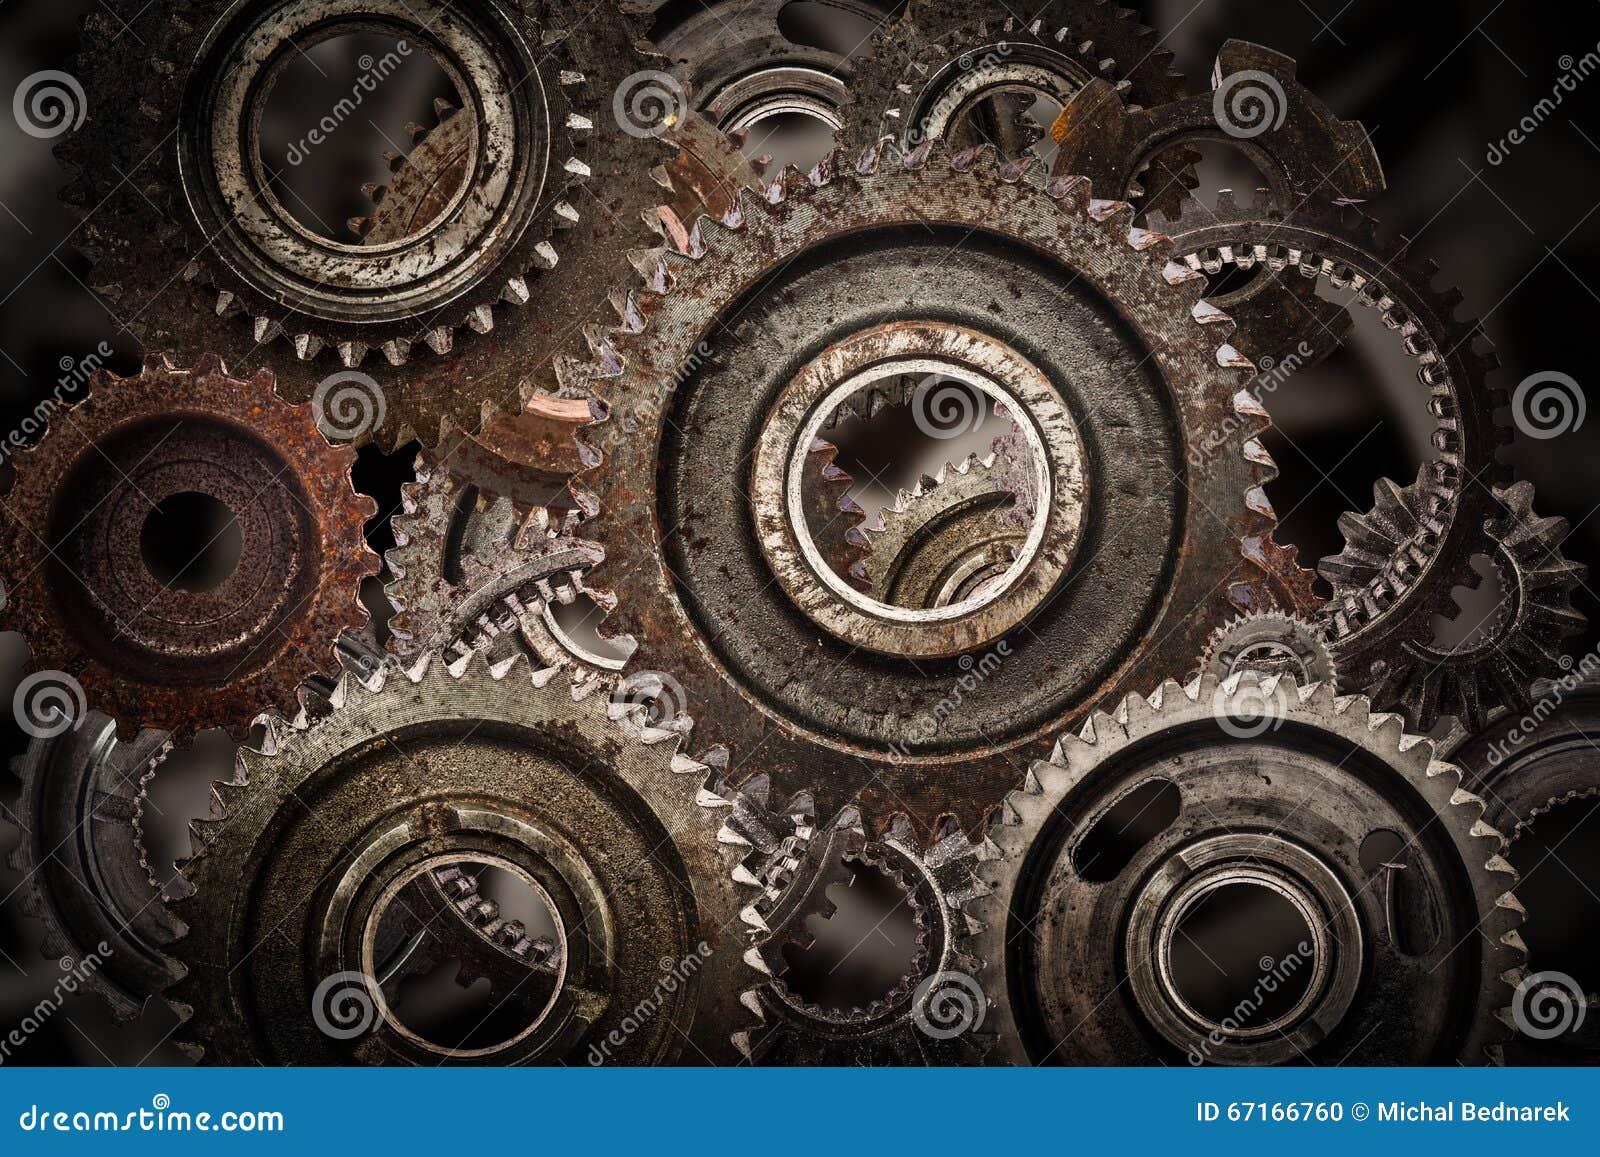 Grunge Gear Cog Wheels Mechanism Background Industry